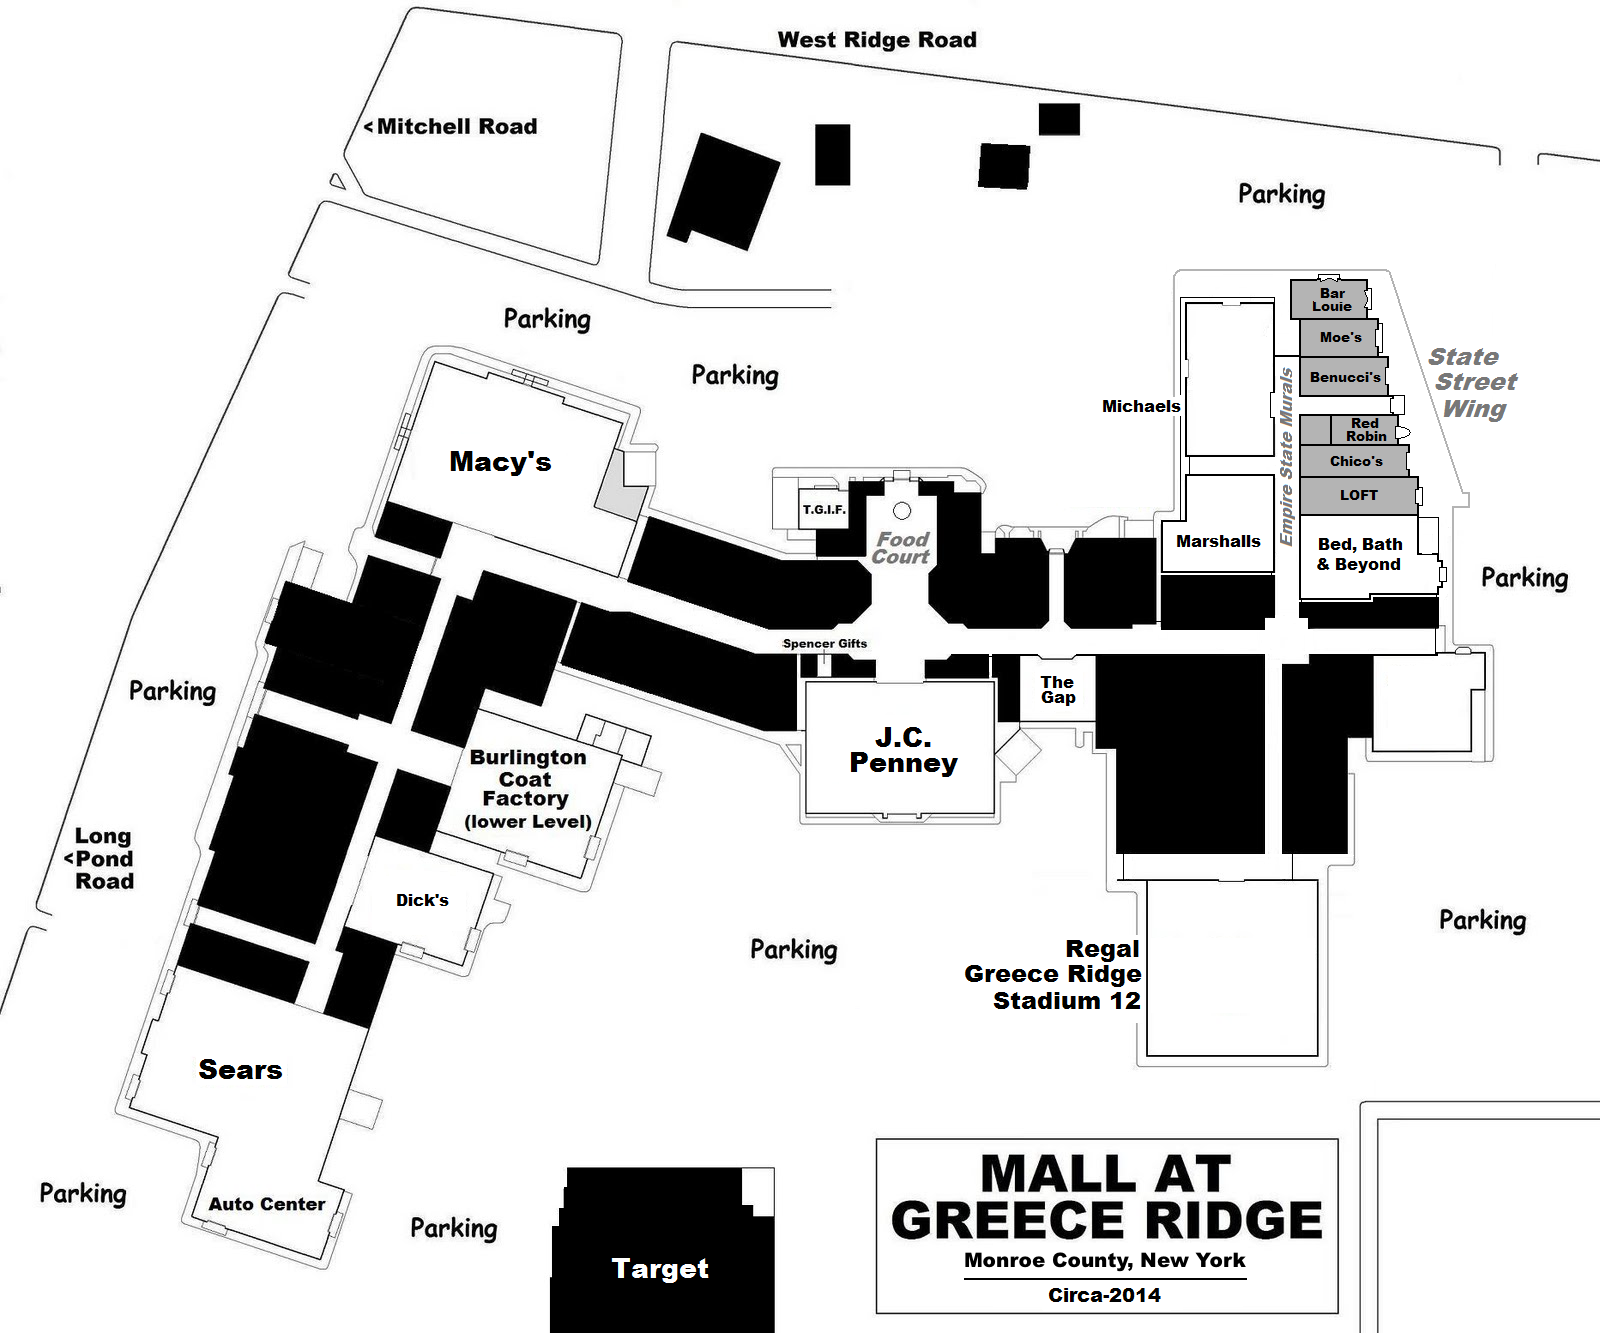 Chicago ridge mall map